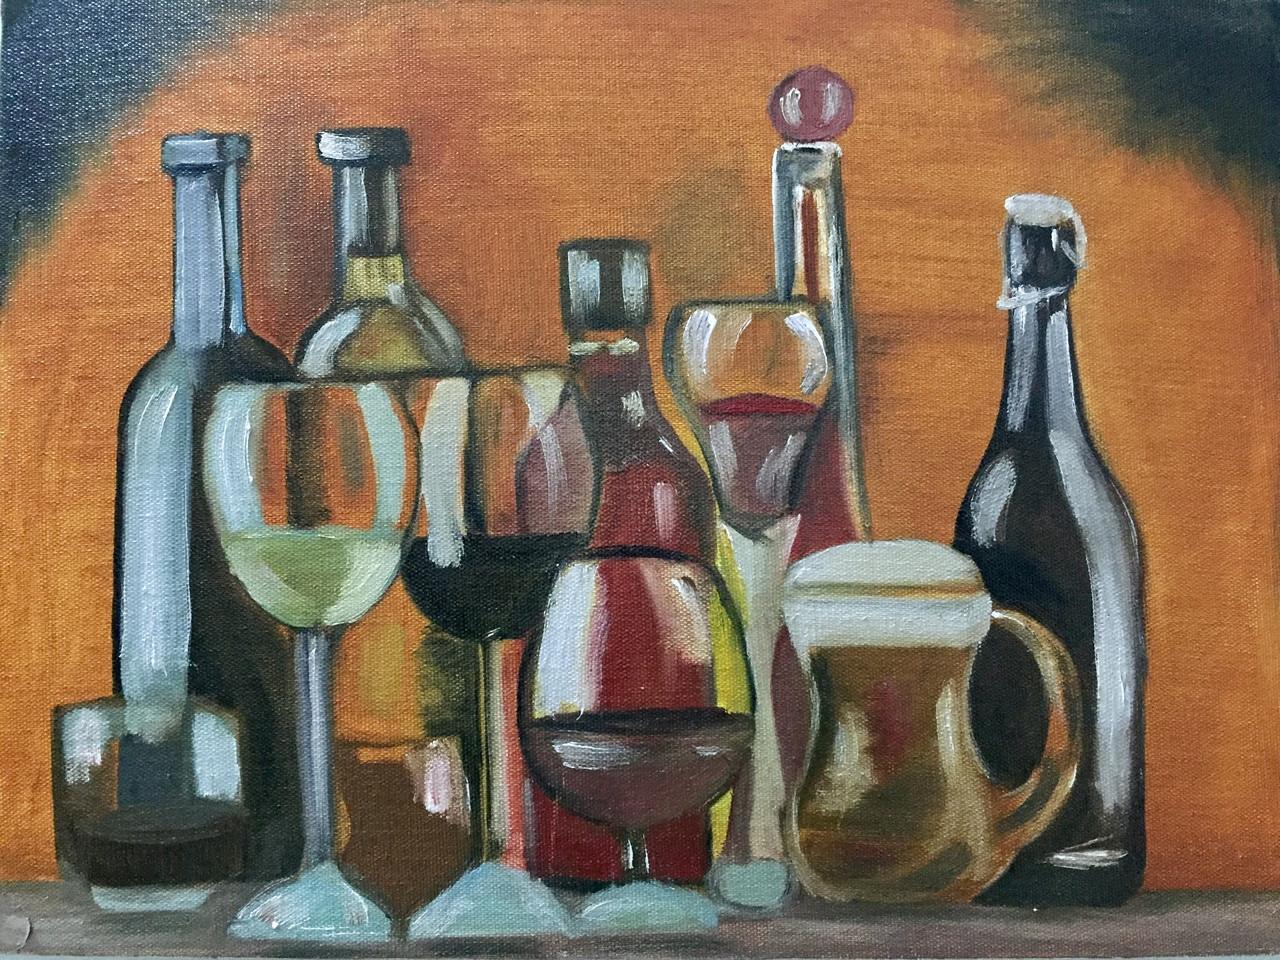 Buy Wine Bottles Handmade Painting By Nithya Gopal Code Art 4154 27516 Paintings For Sale Online In India